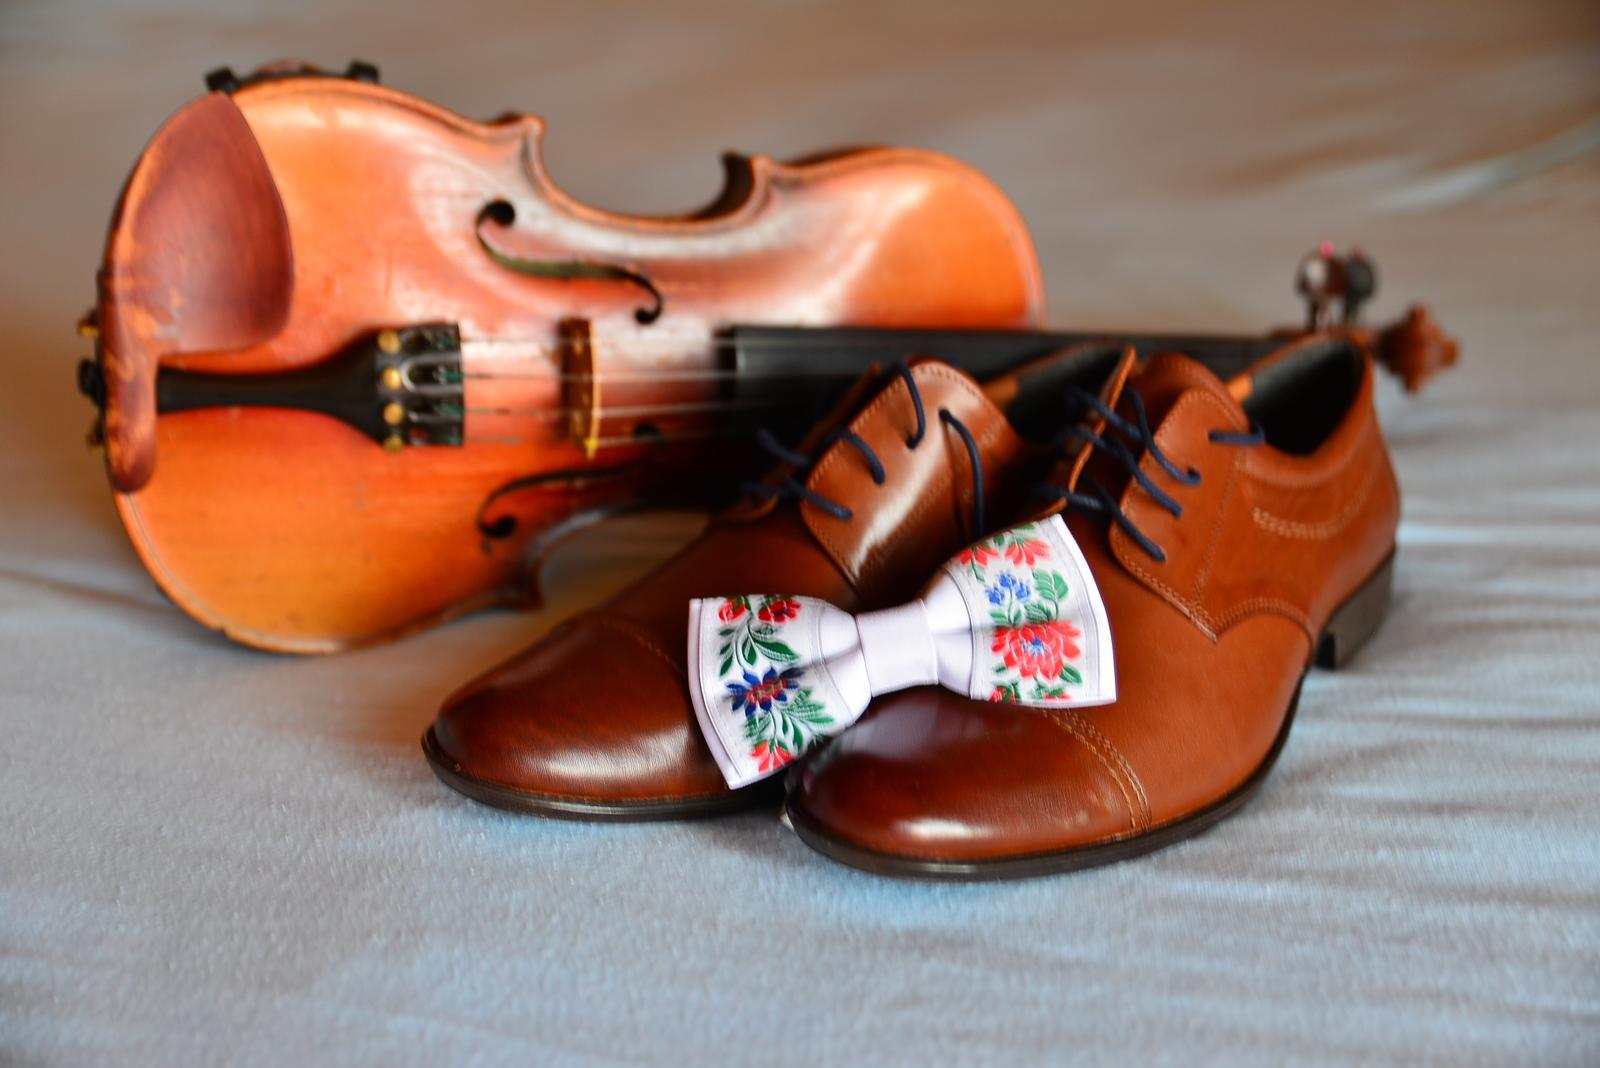 Folklorna svadba M+M, 24.8.2019 Turany - Folklorna svadba M+M, 24.8.2019 Turany, autor Foto: Multimediálny DJ Maroš Chvojka 001